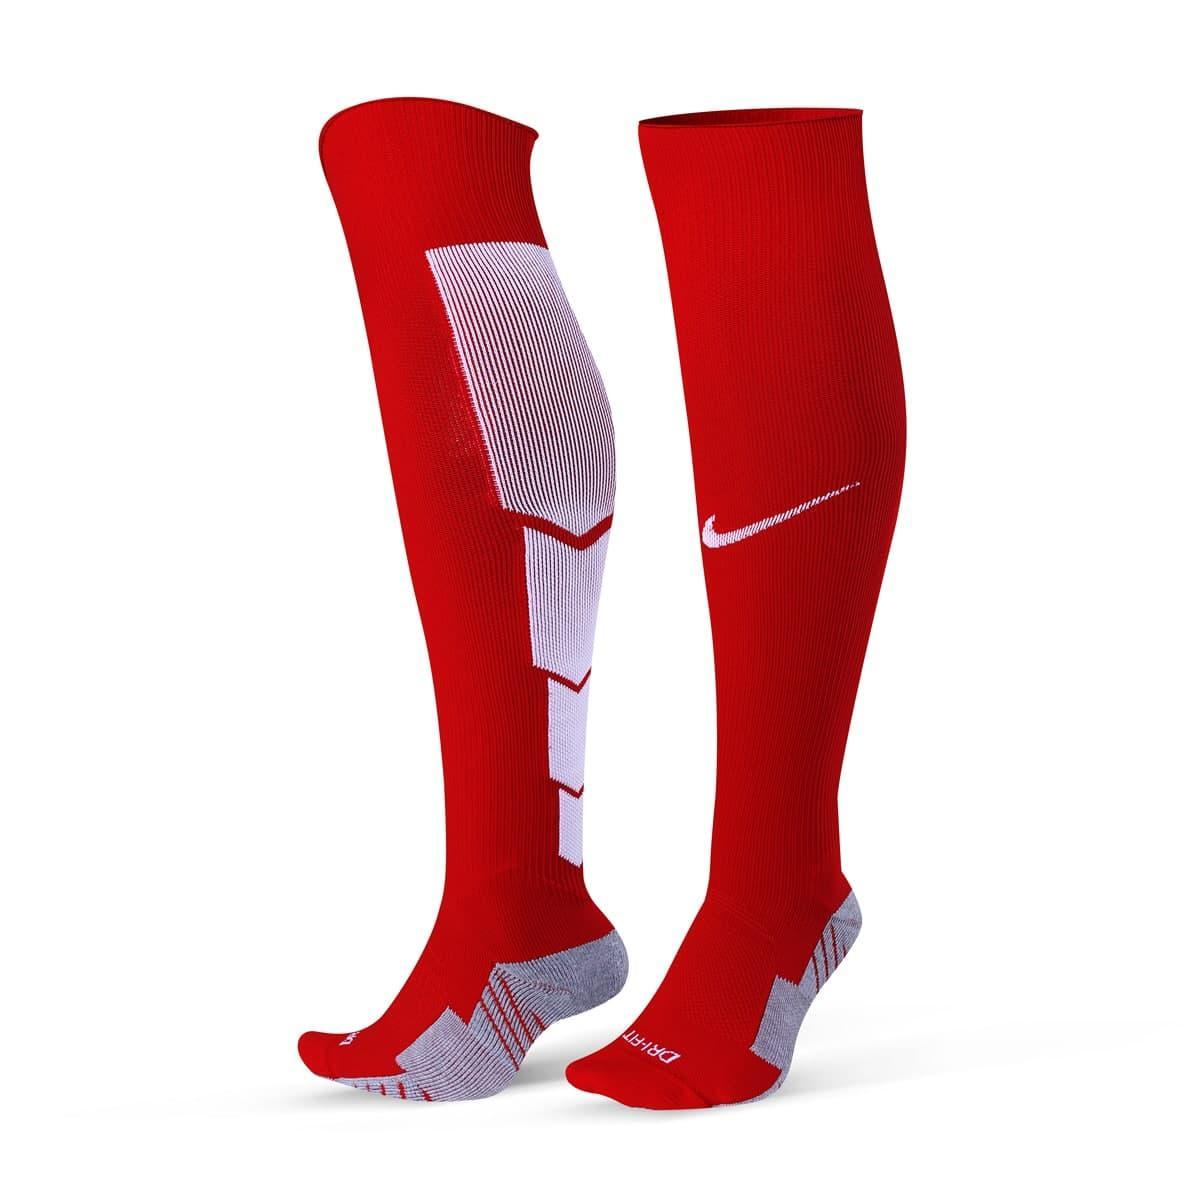 Футбольные гетры Nike (красные)